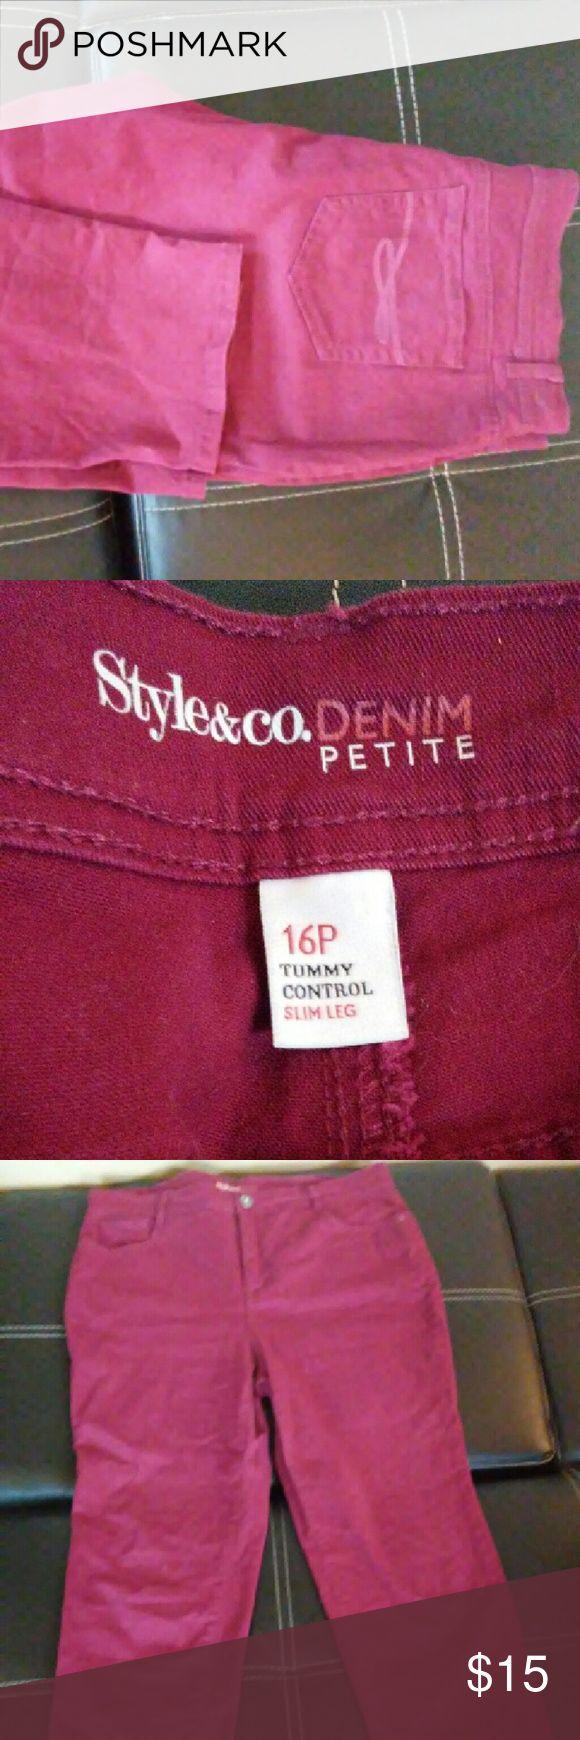 Burgundy Petite skinny jeans tummy control Size 16P Burgundy Petite skinny jeans by Style & Co Style & Co Jeans Skinny